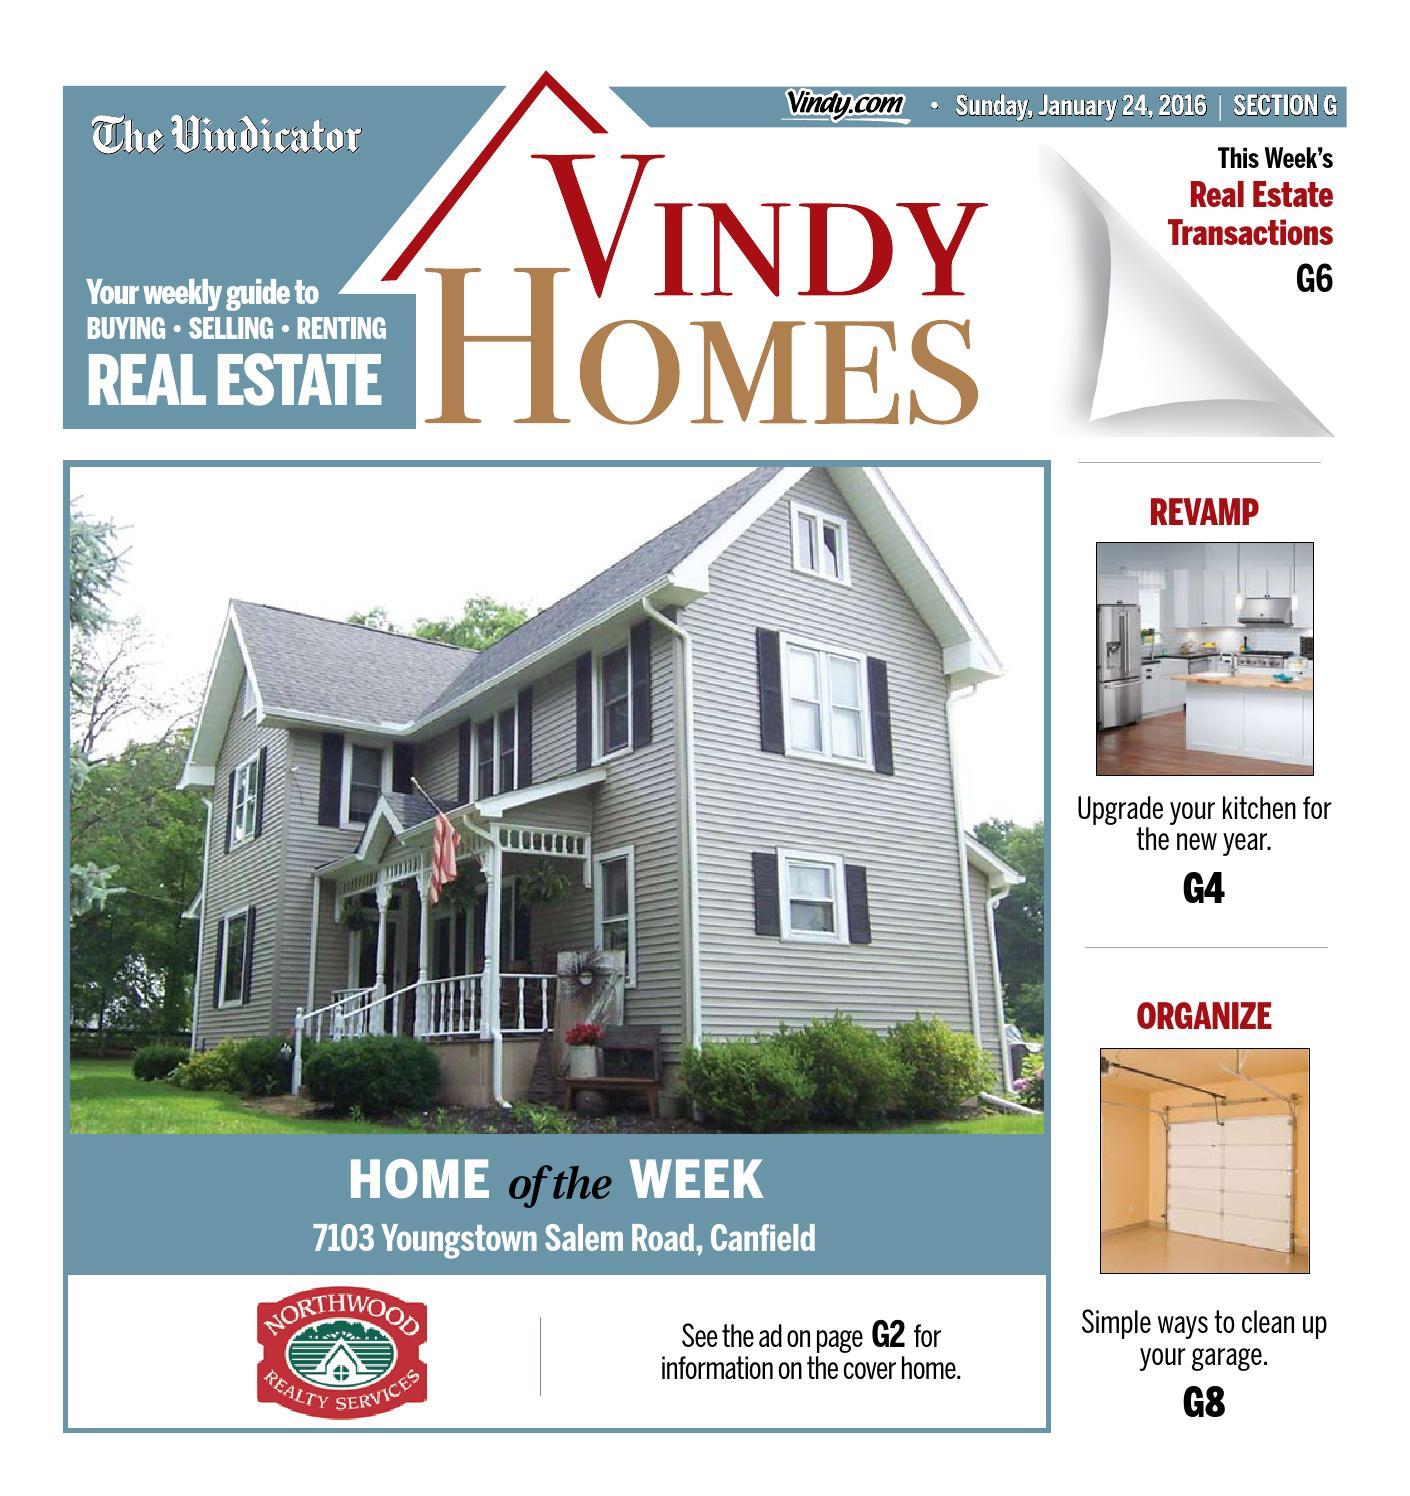 Vindy Homes - January 24, 2016 by The Vindicator - issuu